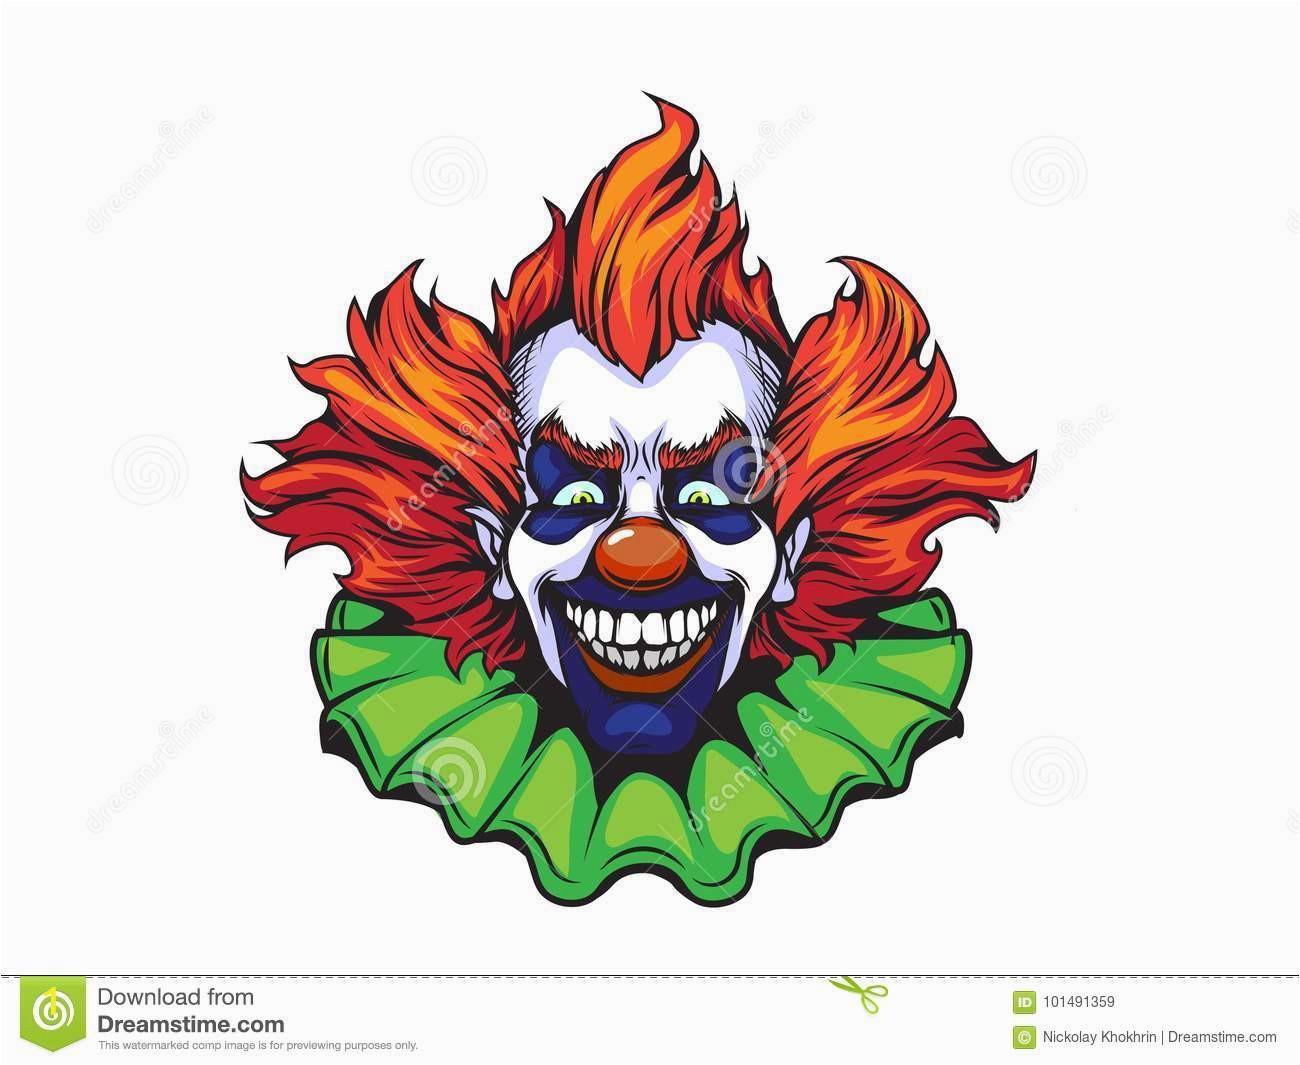 evil clown halloween illustration evil clown halloween illustration nand drawn style